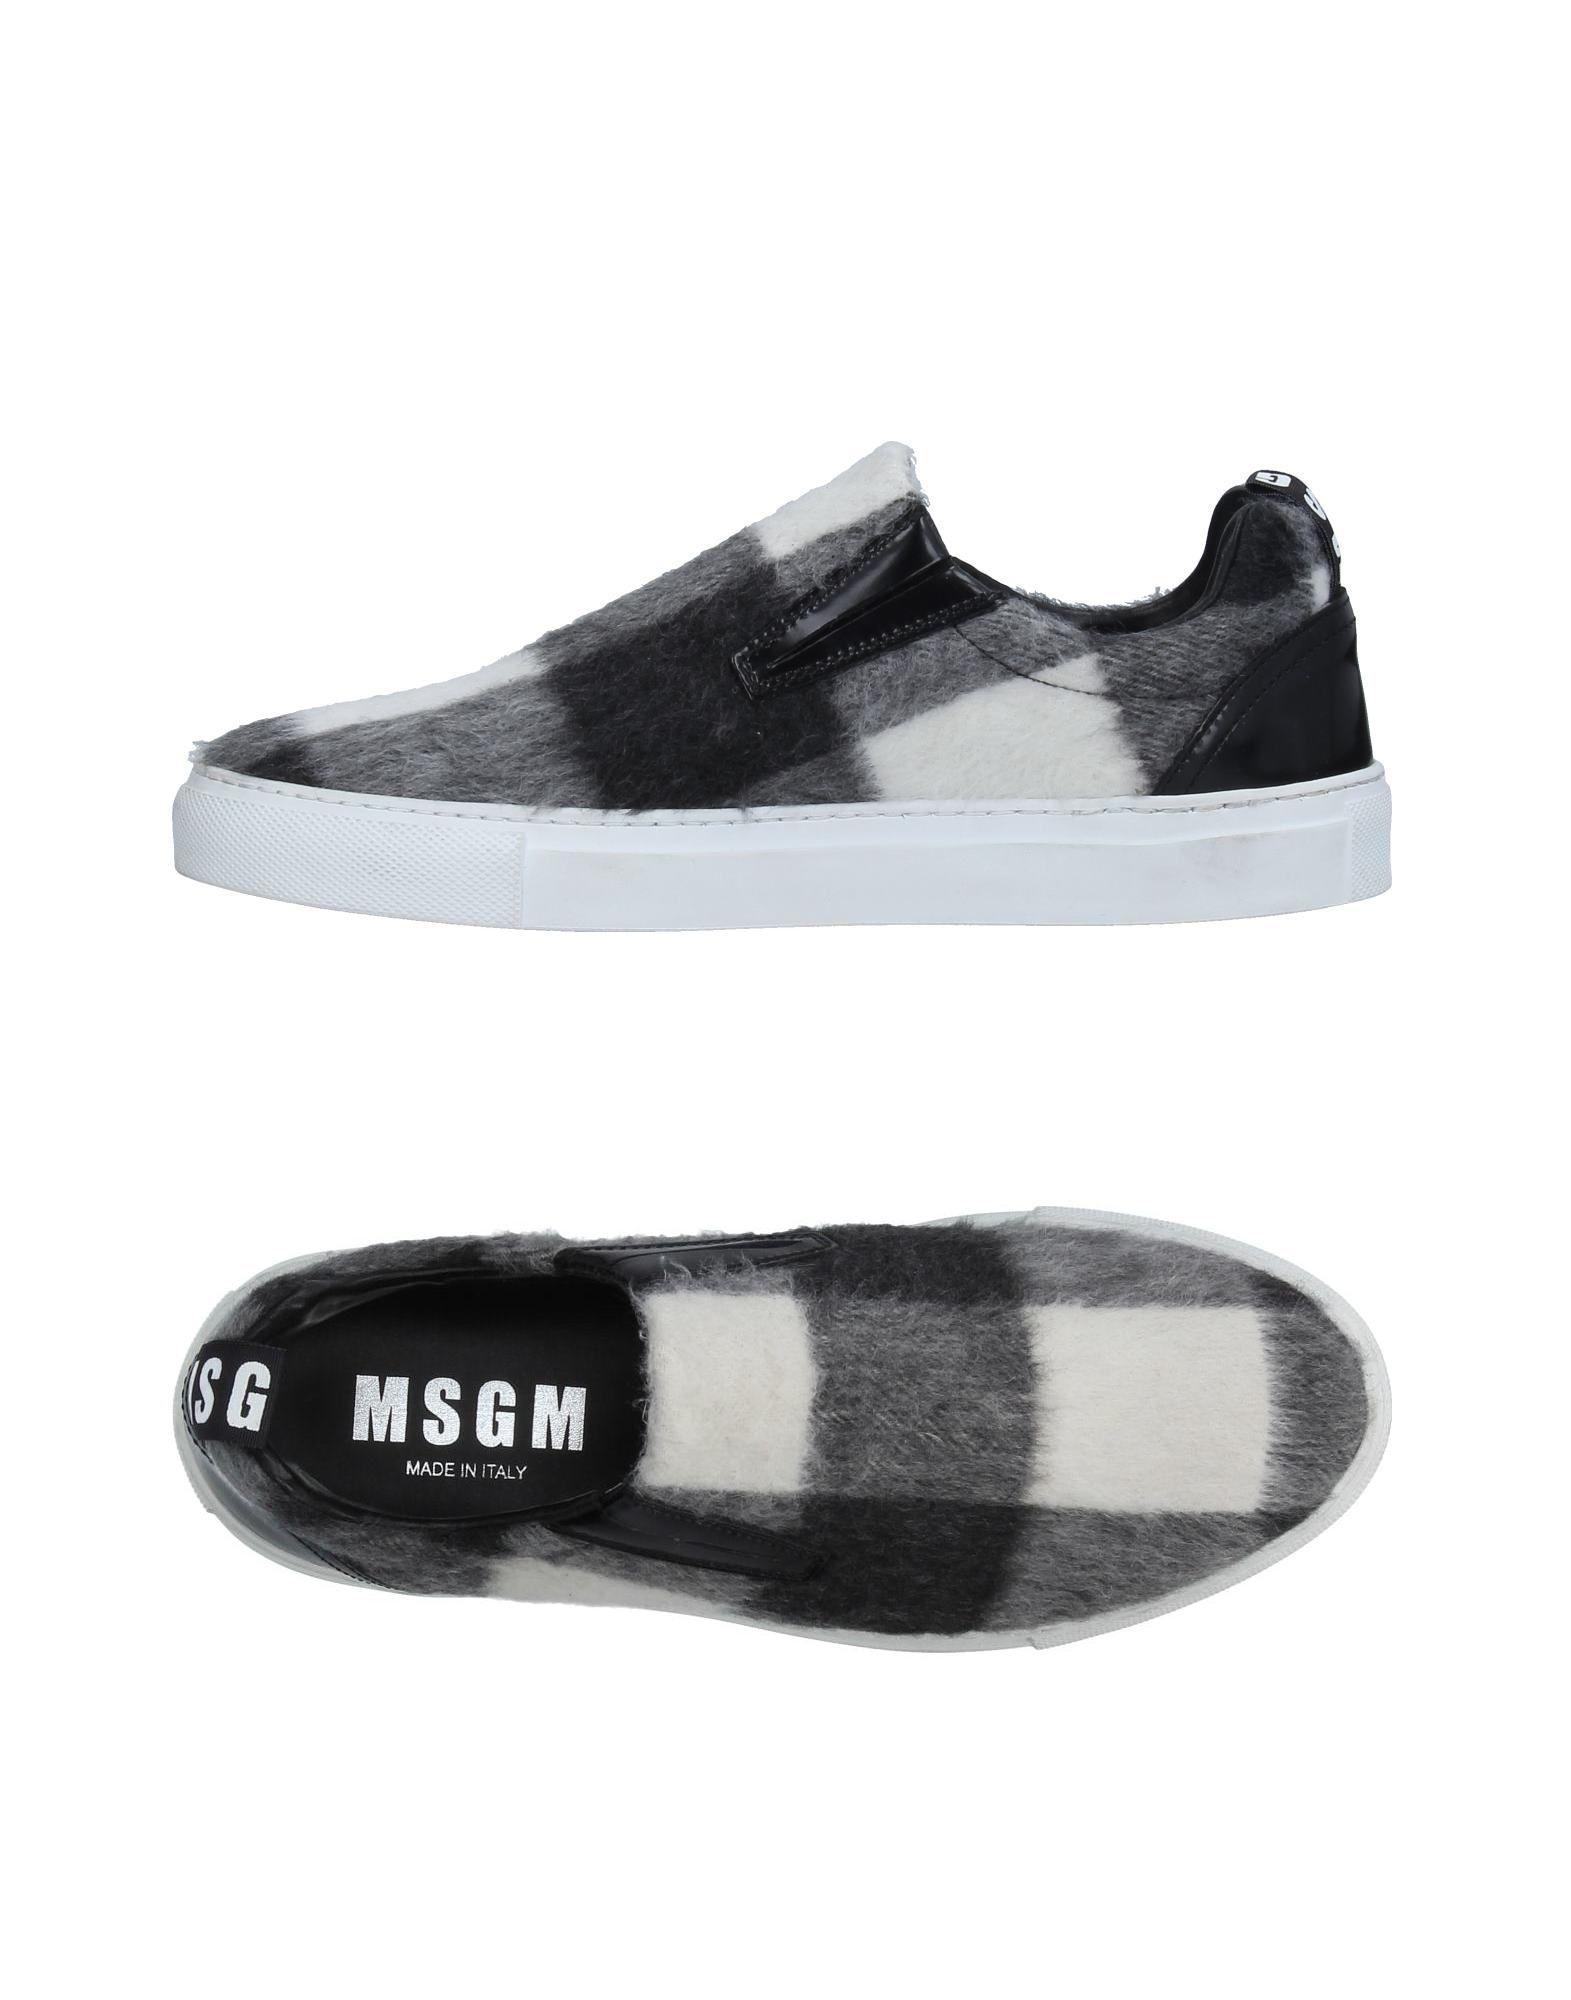 Msgm Sneakers Damen  11259230AAGut aussehende strapazierfähige Schuhe